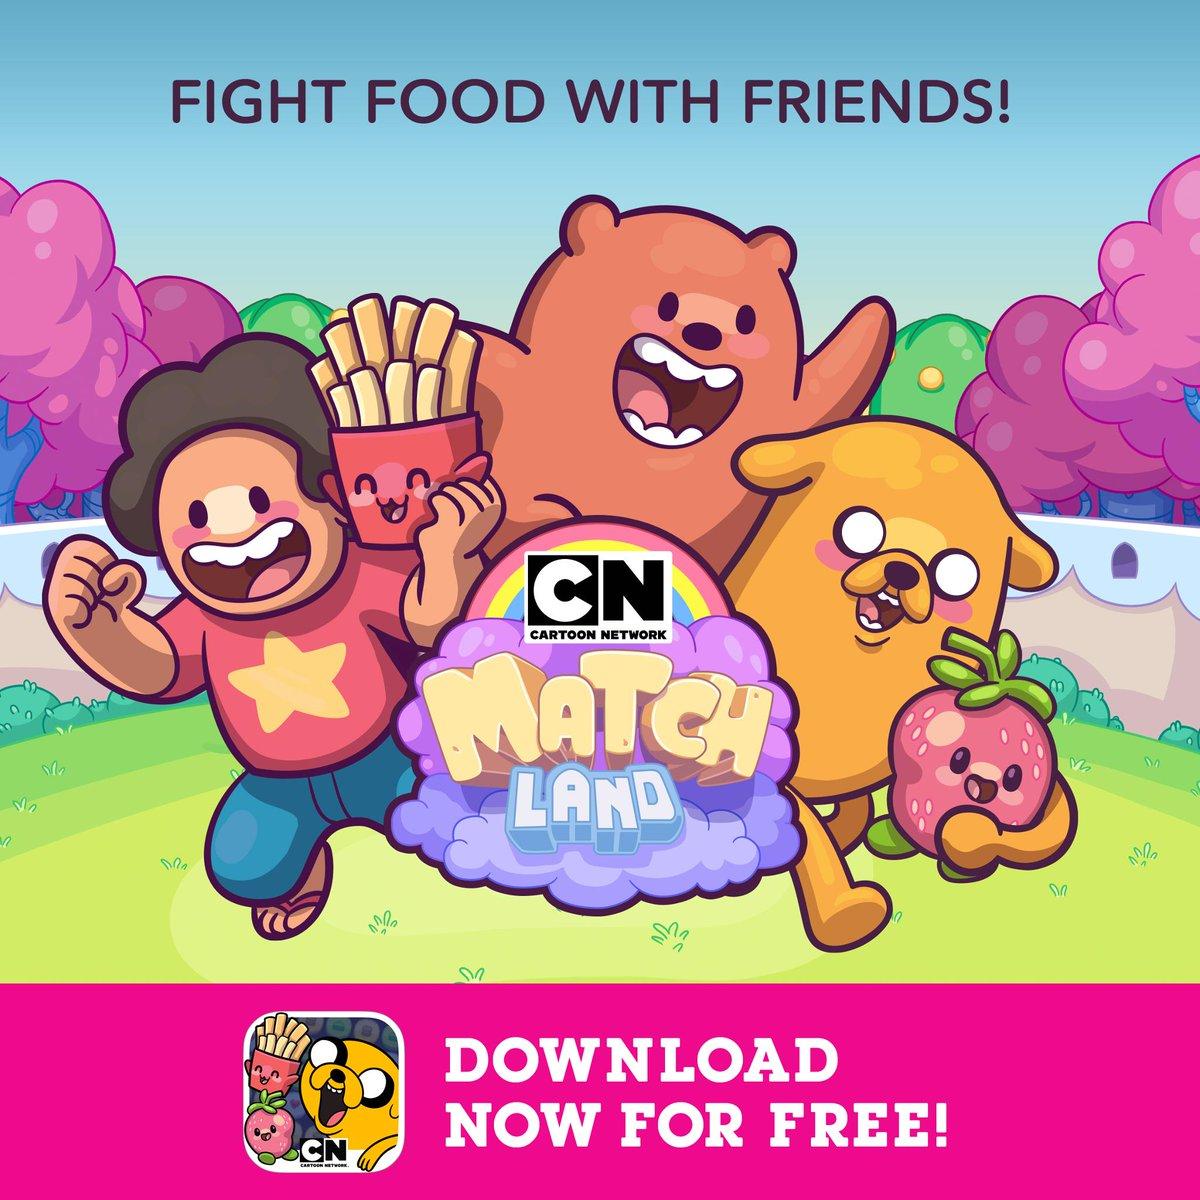 Cartoon Network on Twitter: